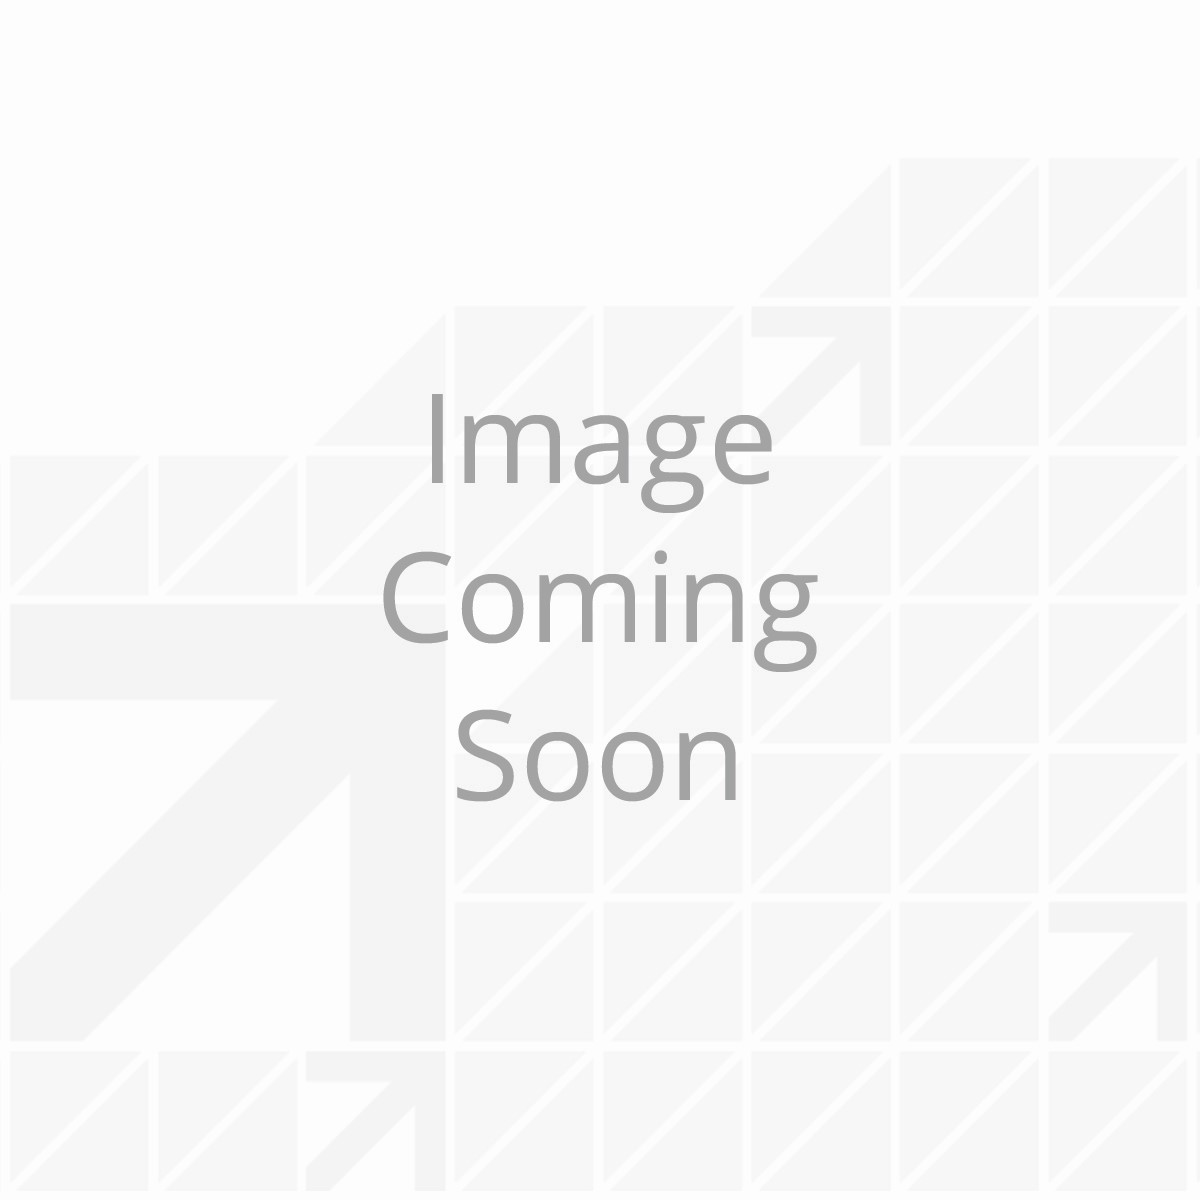 Pacific Rim; 2'' A-Frame Coupler; 5000#; Oily